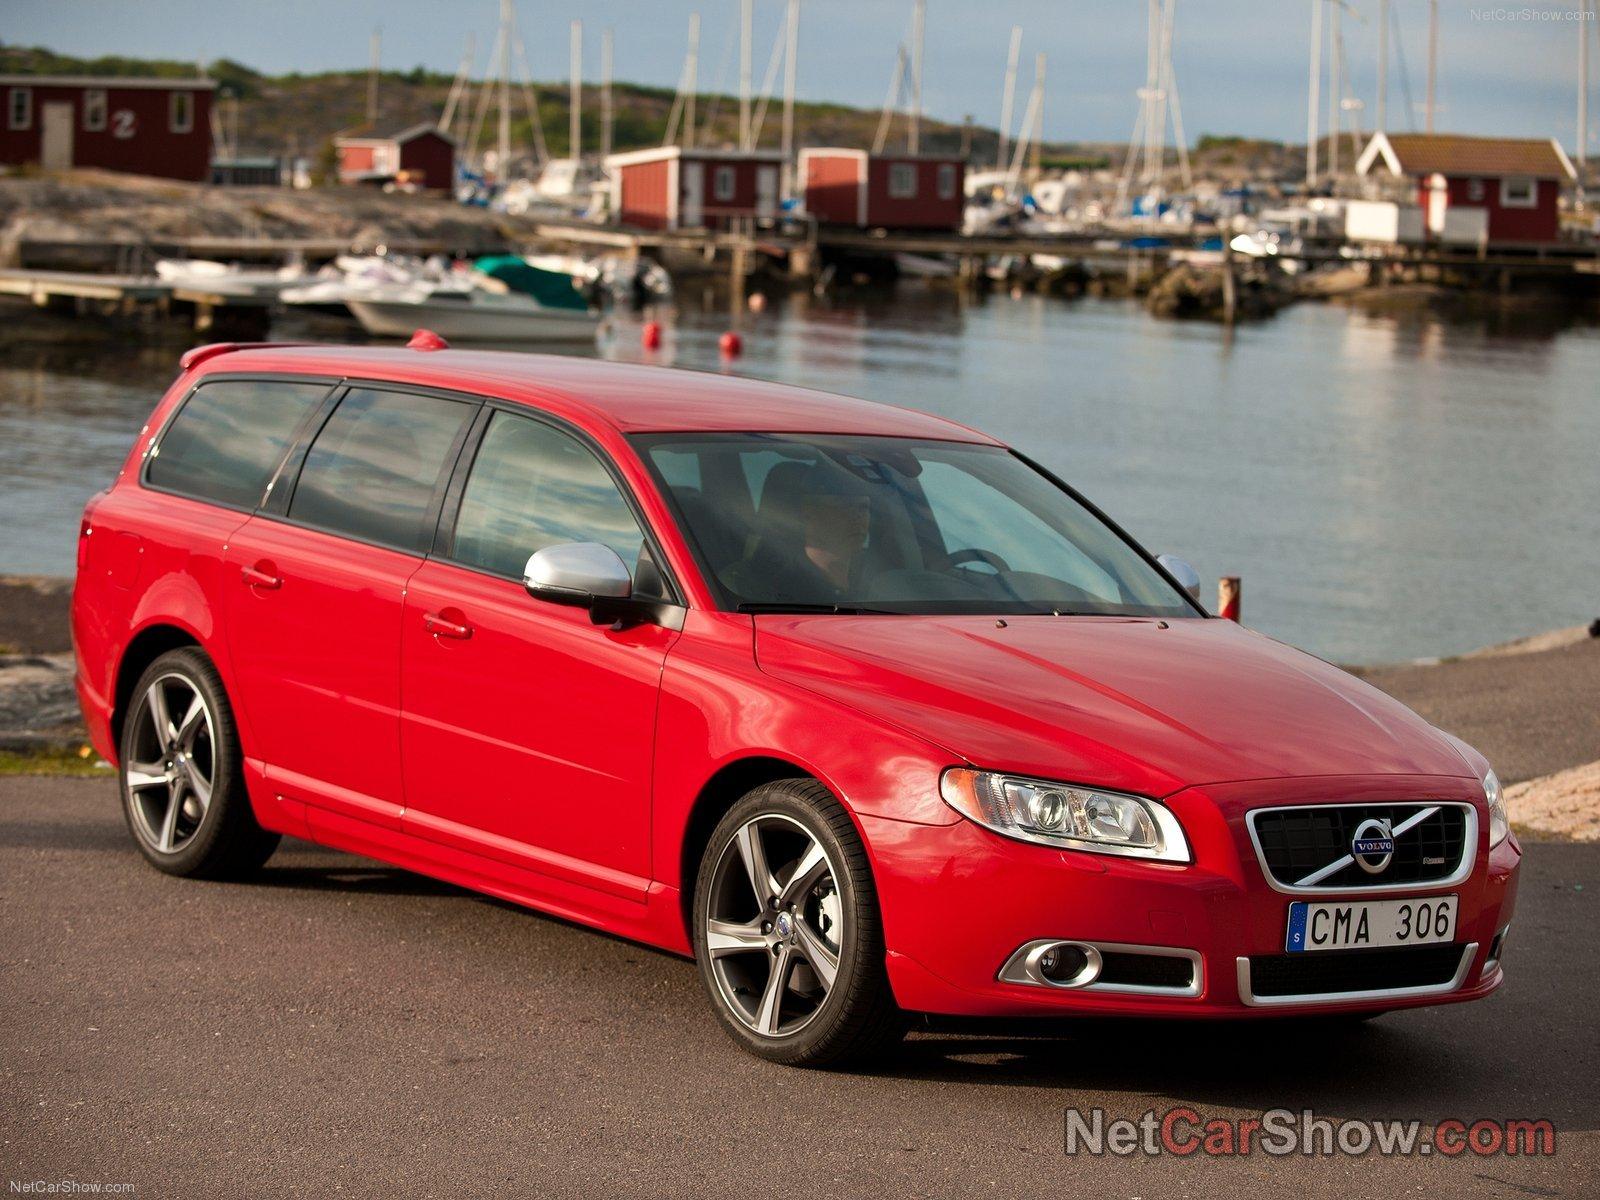 Used Volvo V70 R For Sale - CarGurus   2011 Volvo V70 Wagon